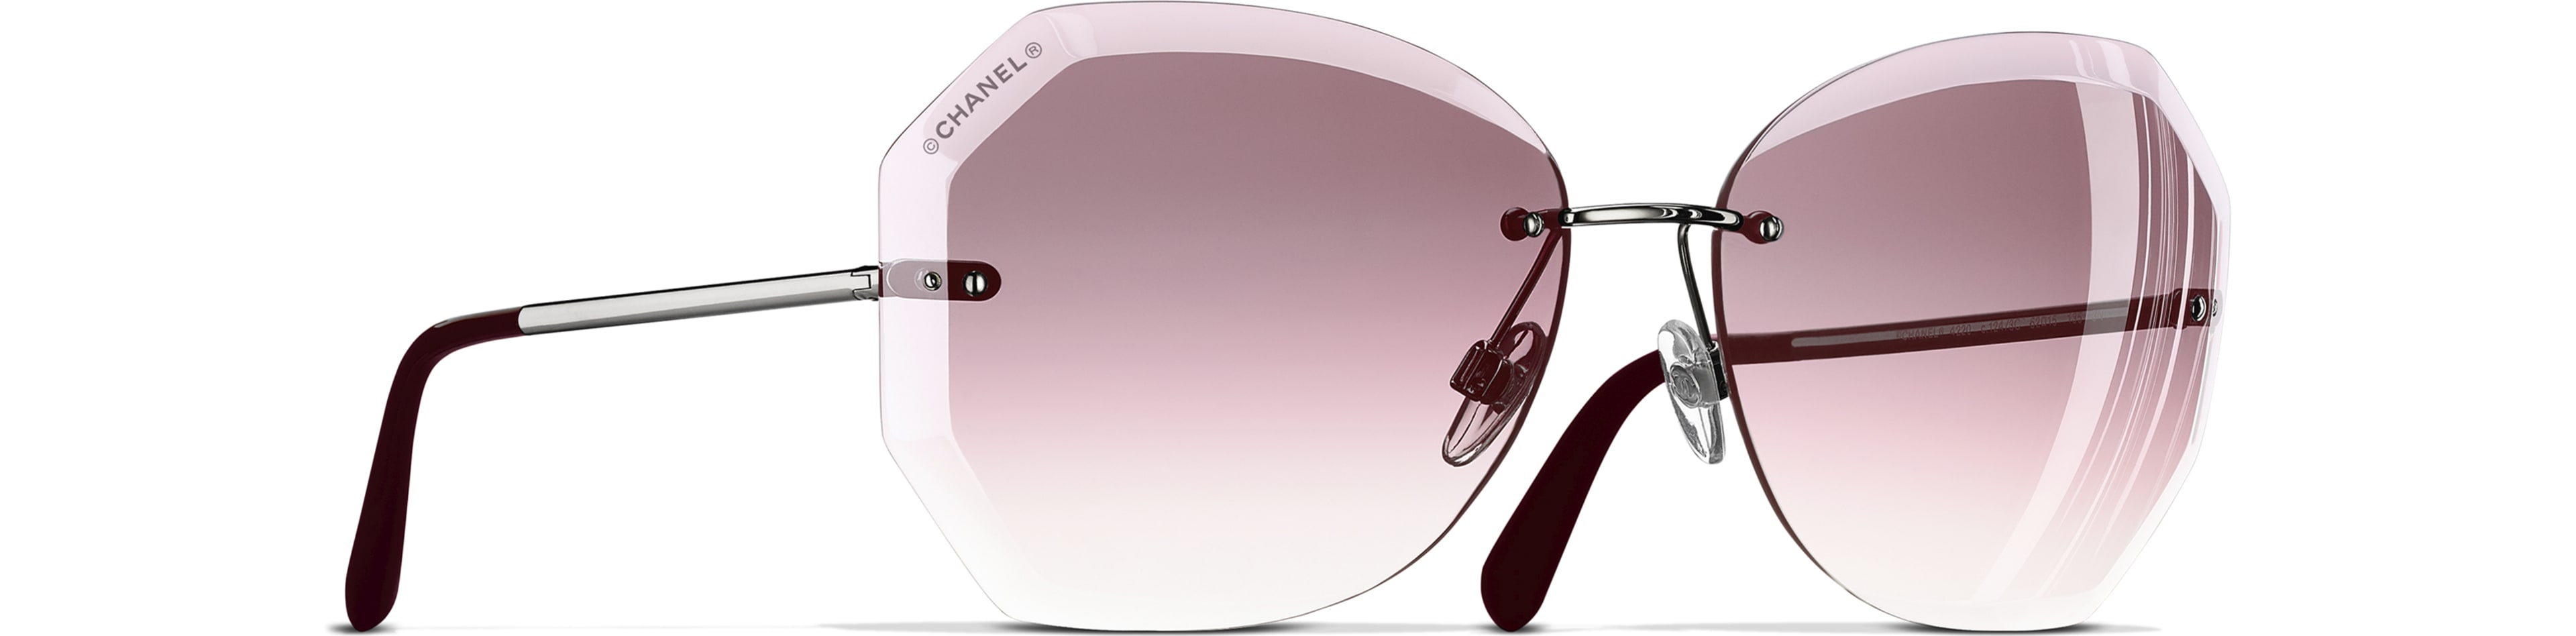 Metal silver & pink frame. Pink gradient lenses